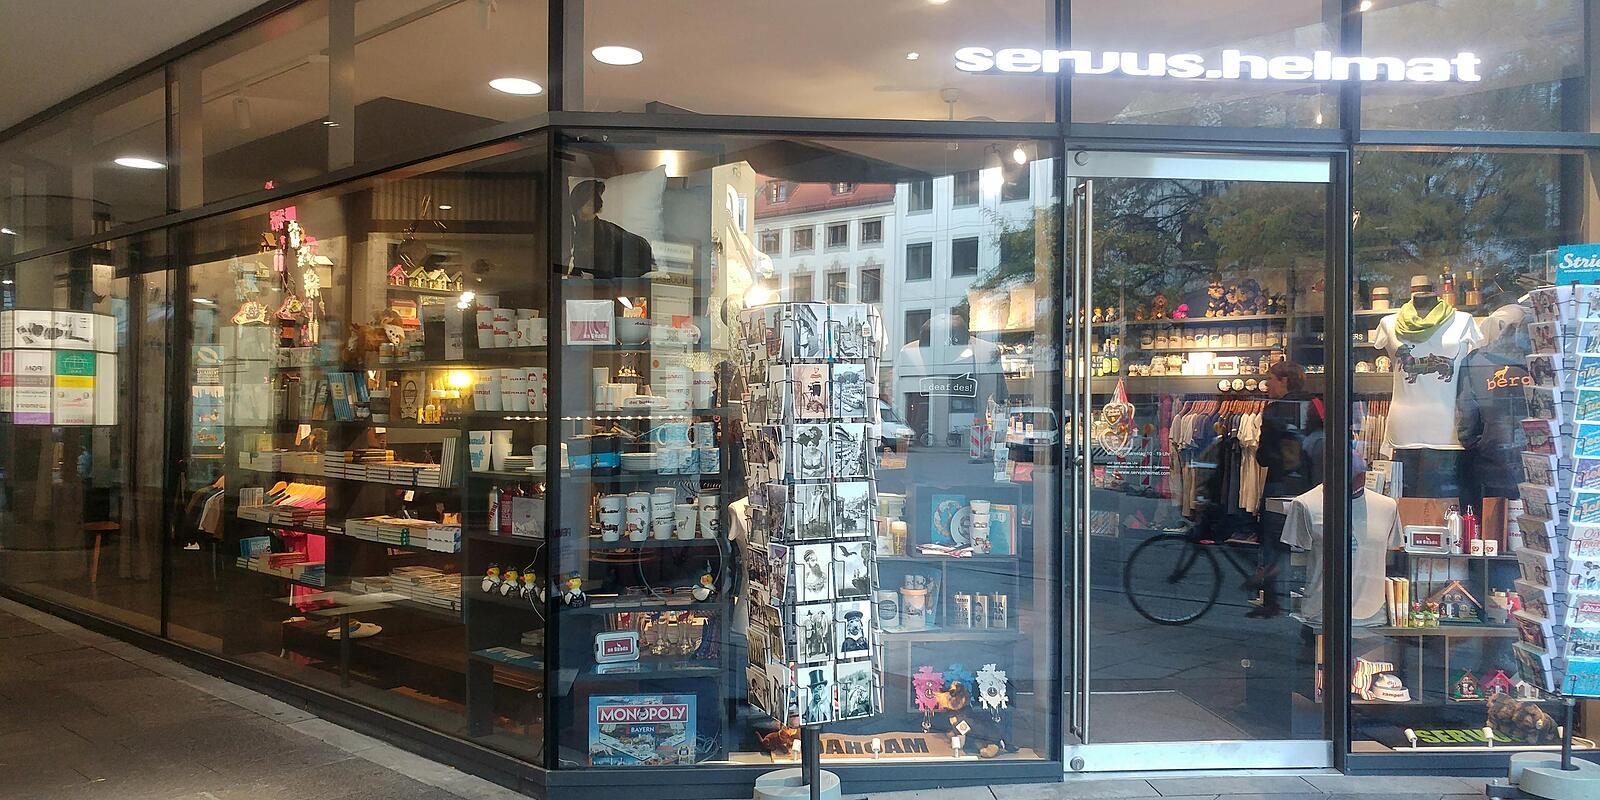 servus heimat, Brunnstr., Asam-Hof Altstadt, München - T ...